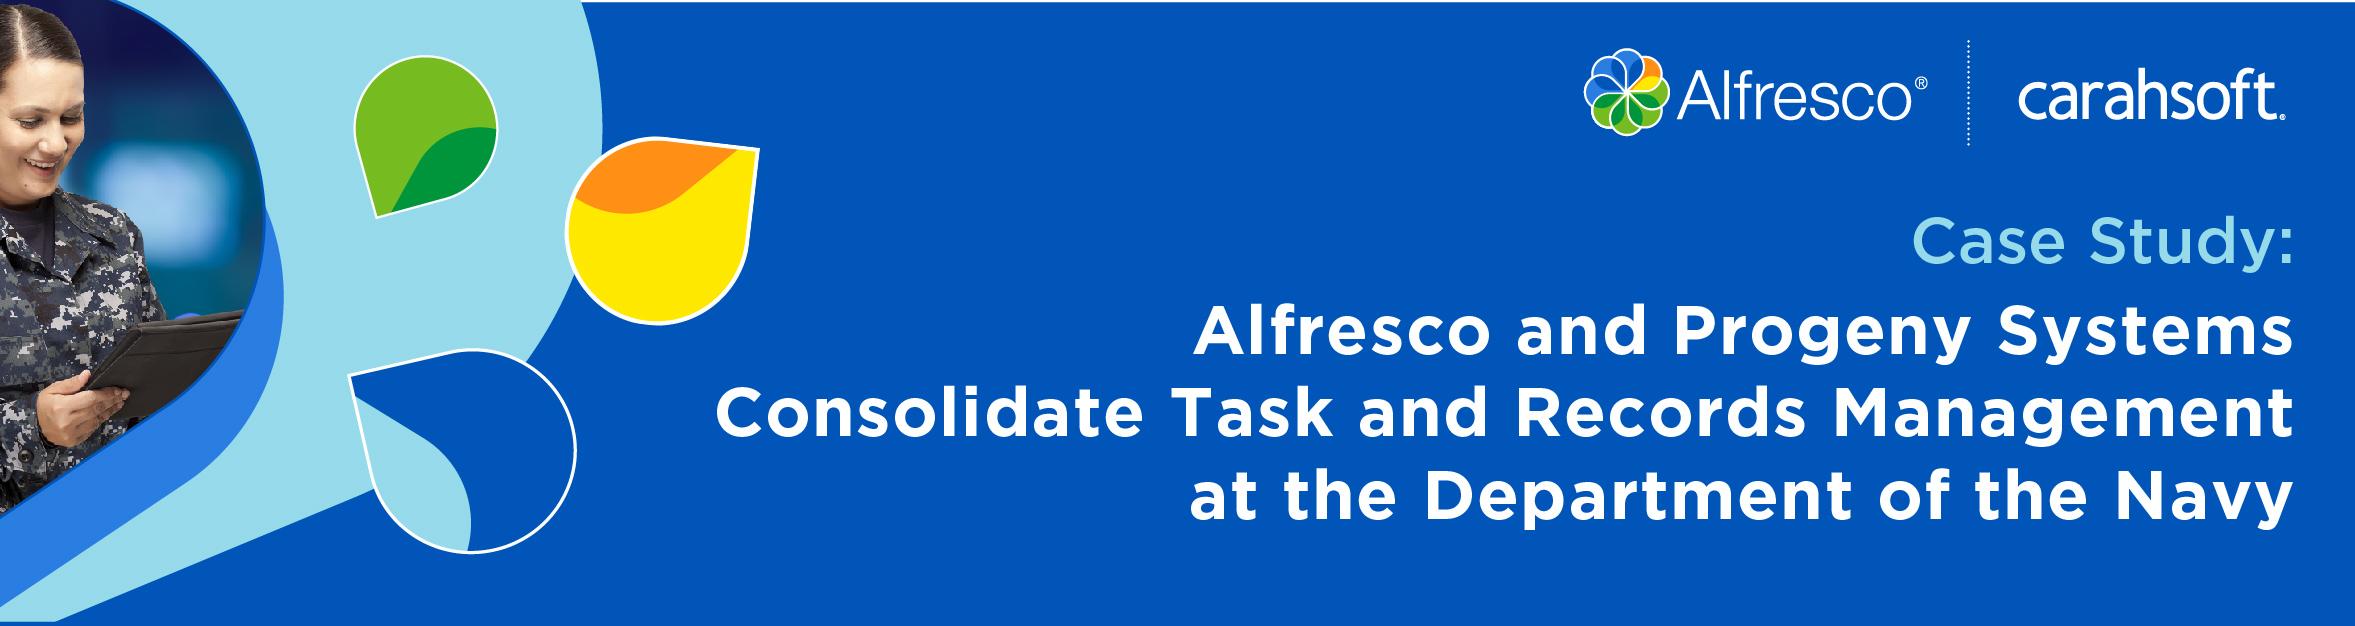 Alfresco Consolidate Tasks at Navy_LP Banner.jpg